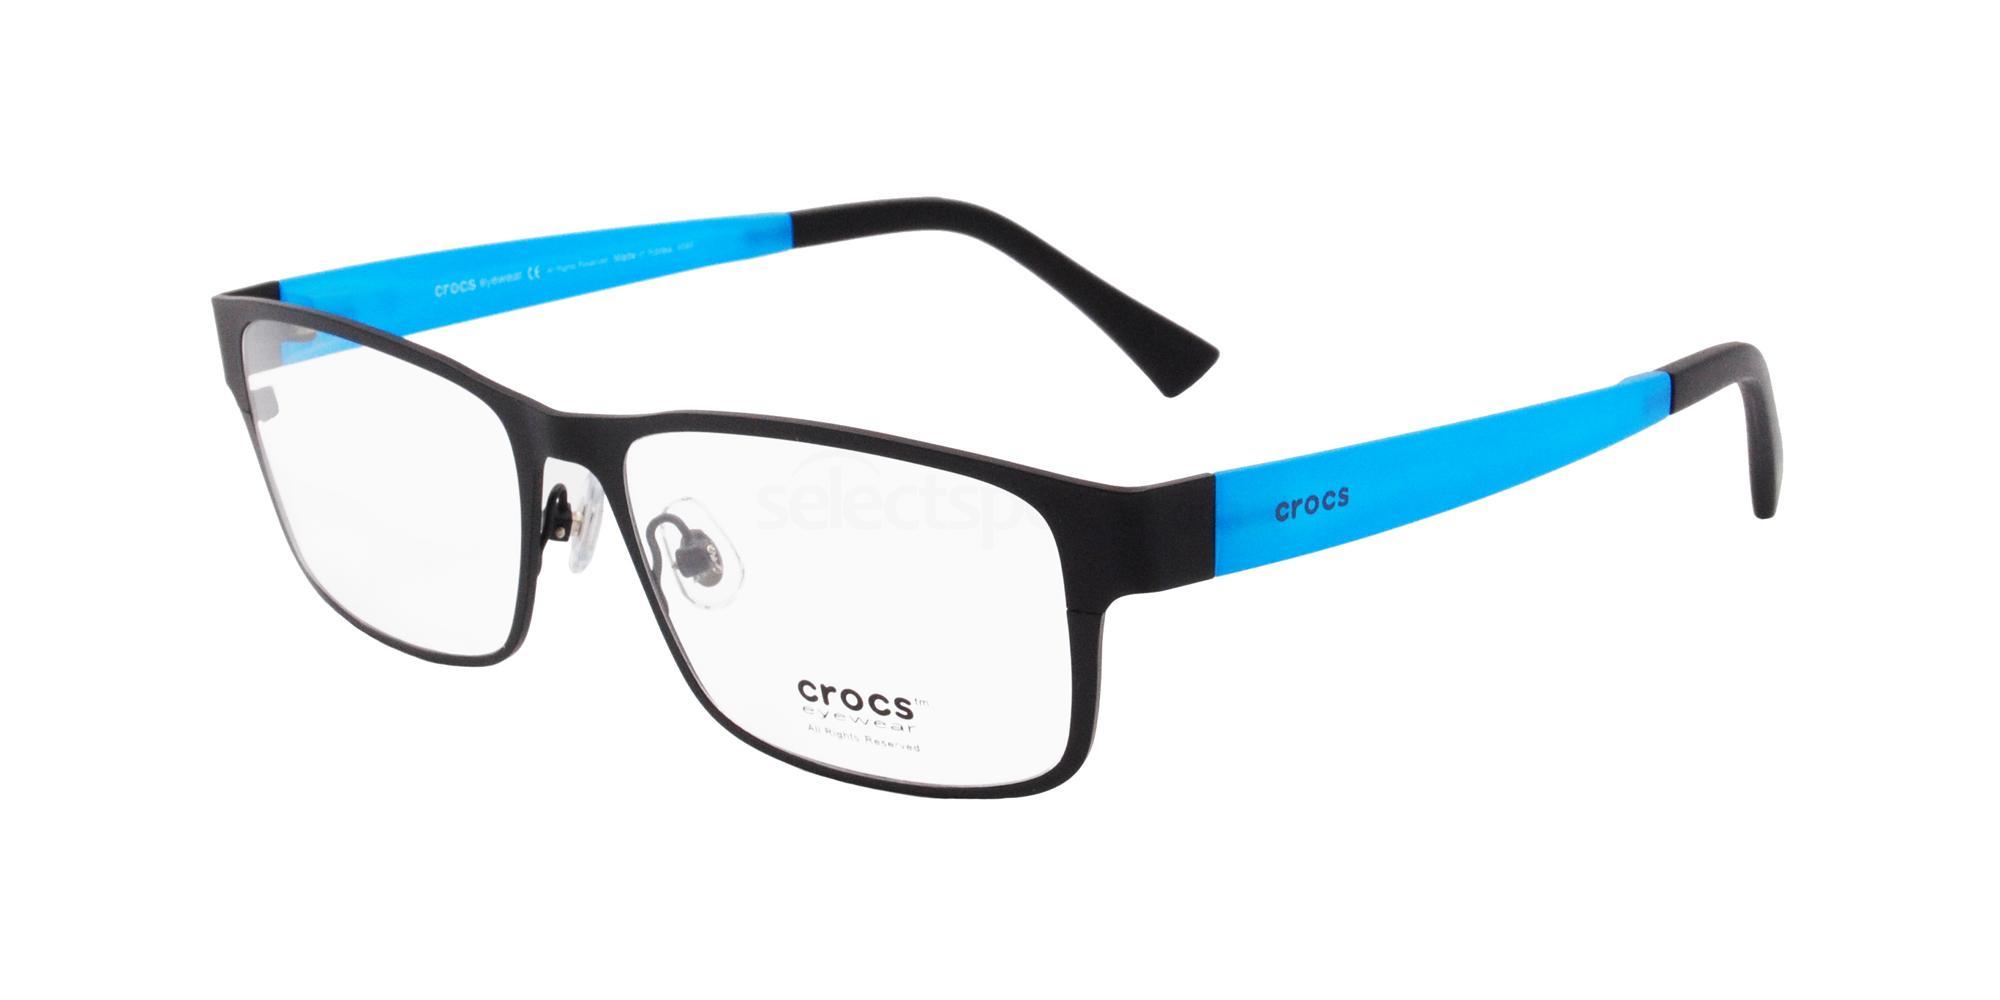 20BE CF645 Glasses, Crocs Eyewear